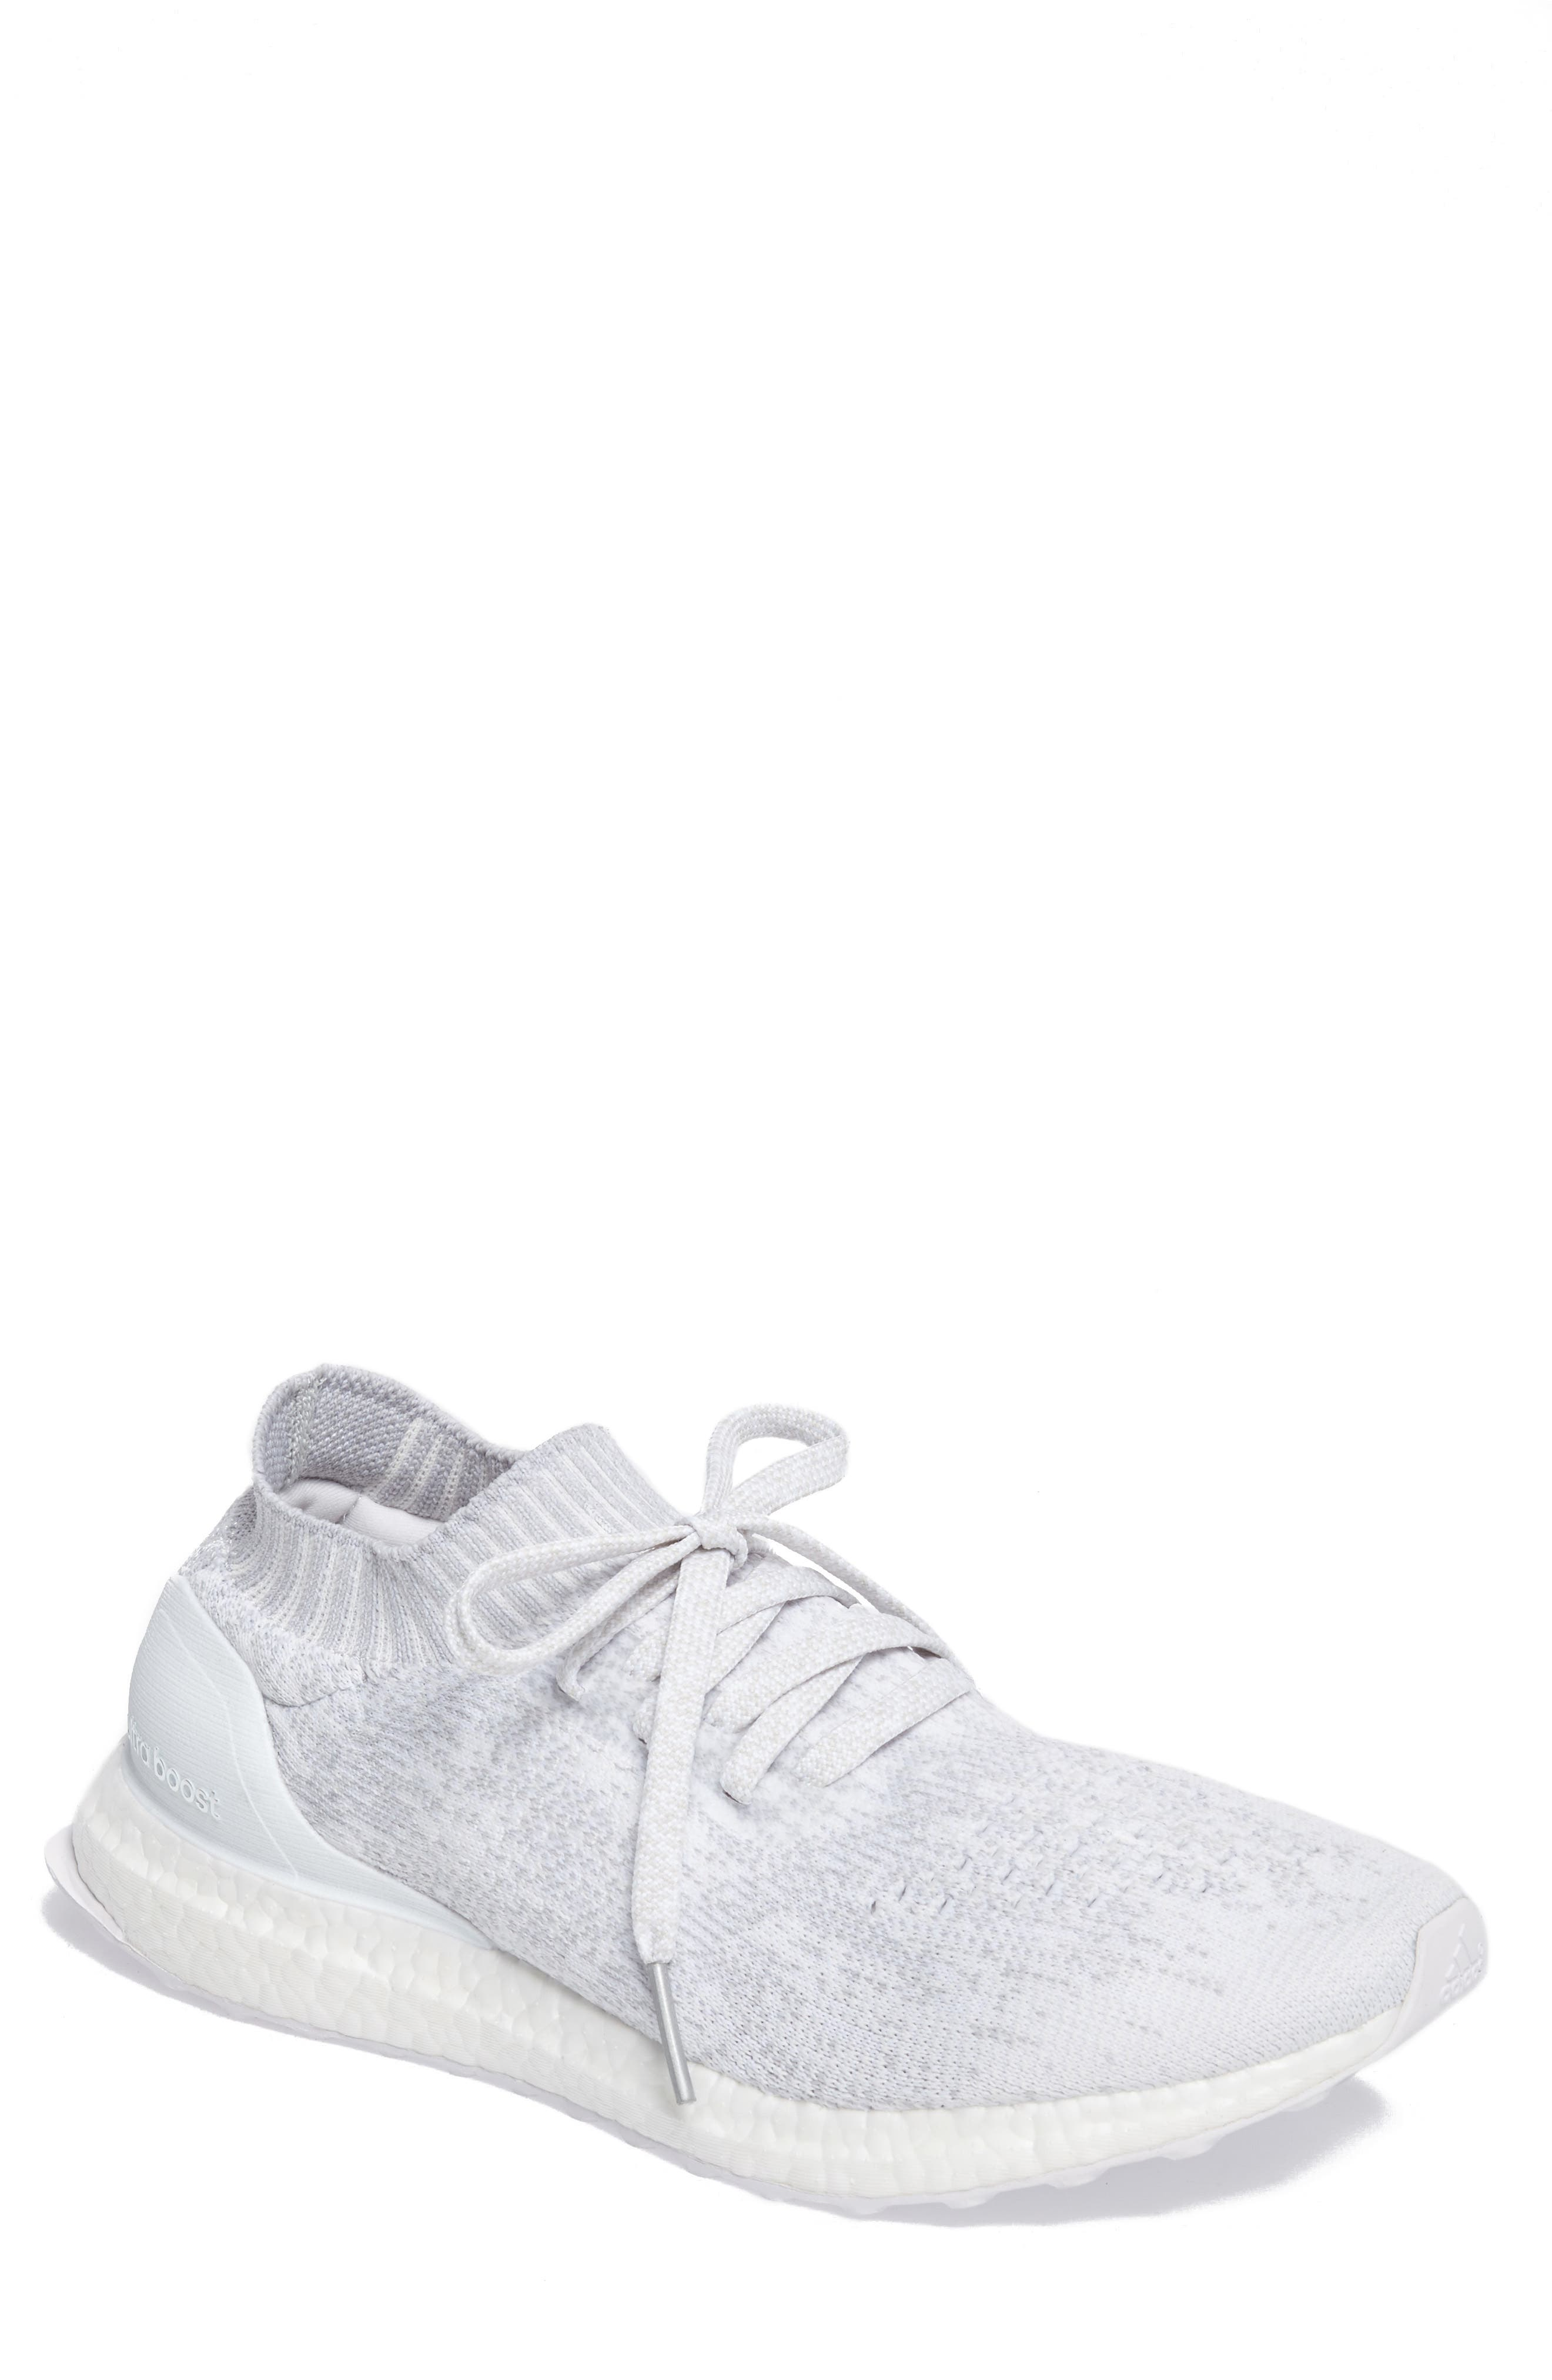 adidas \u0027UltraBOOST Uncaged\u0027 Running Shoe ...